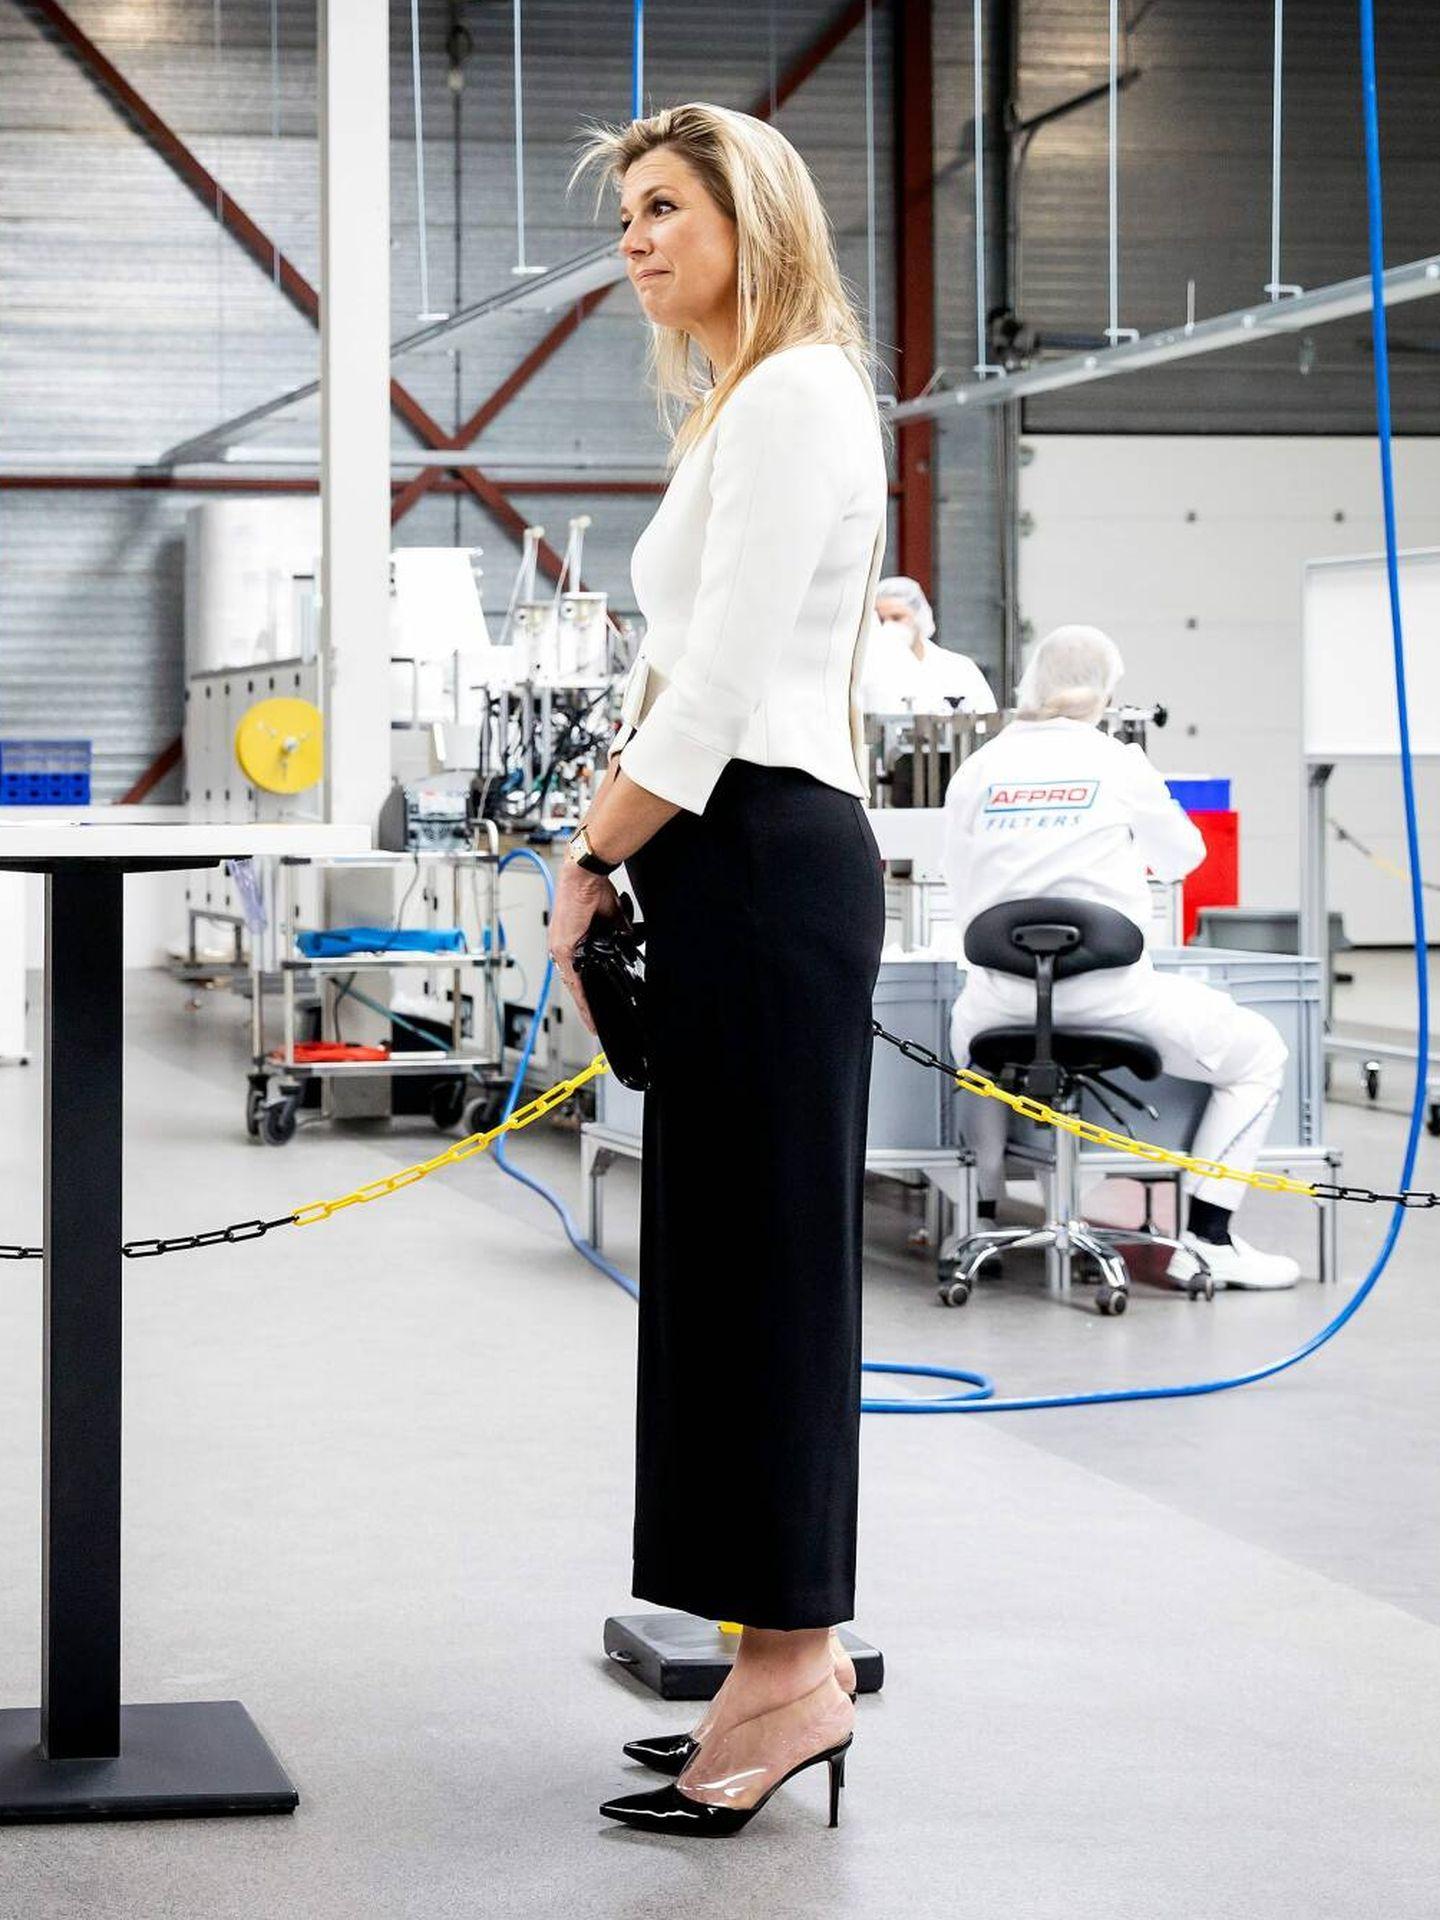 Máxima de Holanda, con zapatos de vinilo en un compromiso oficial. (Cordon Press)